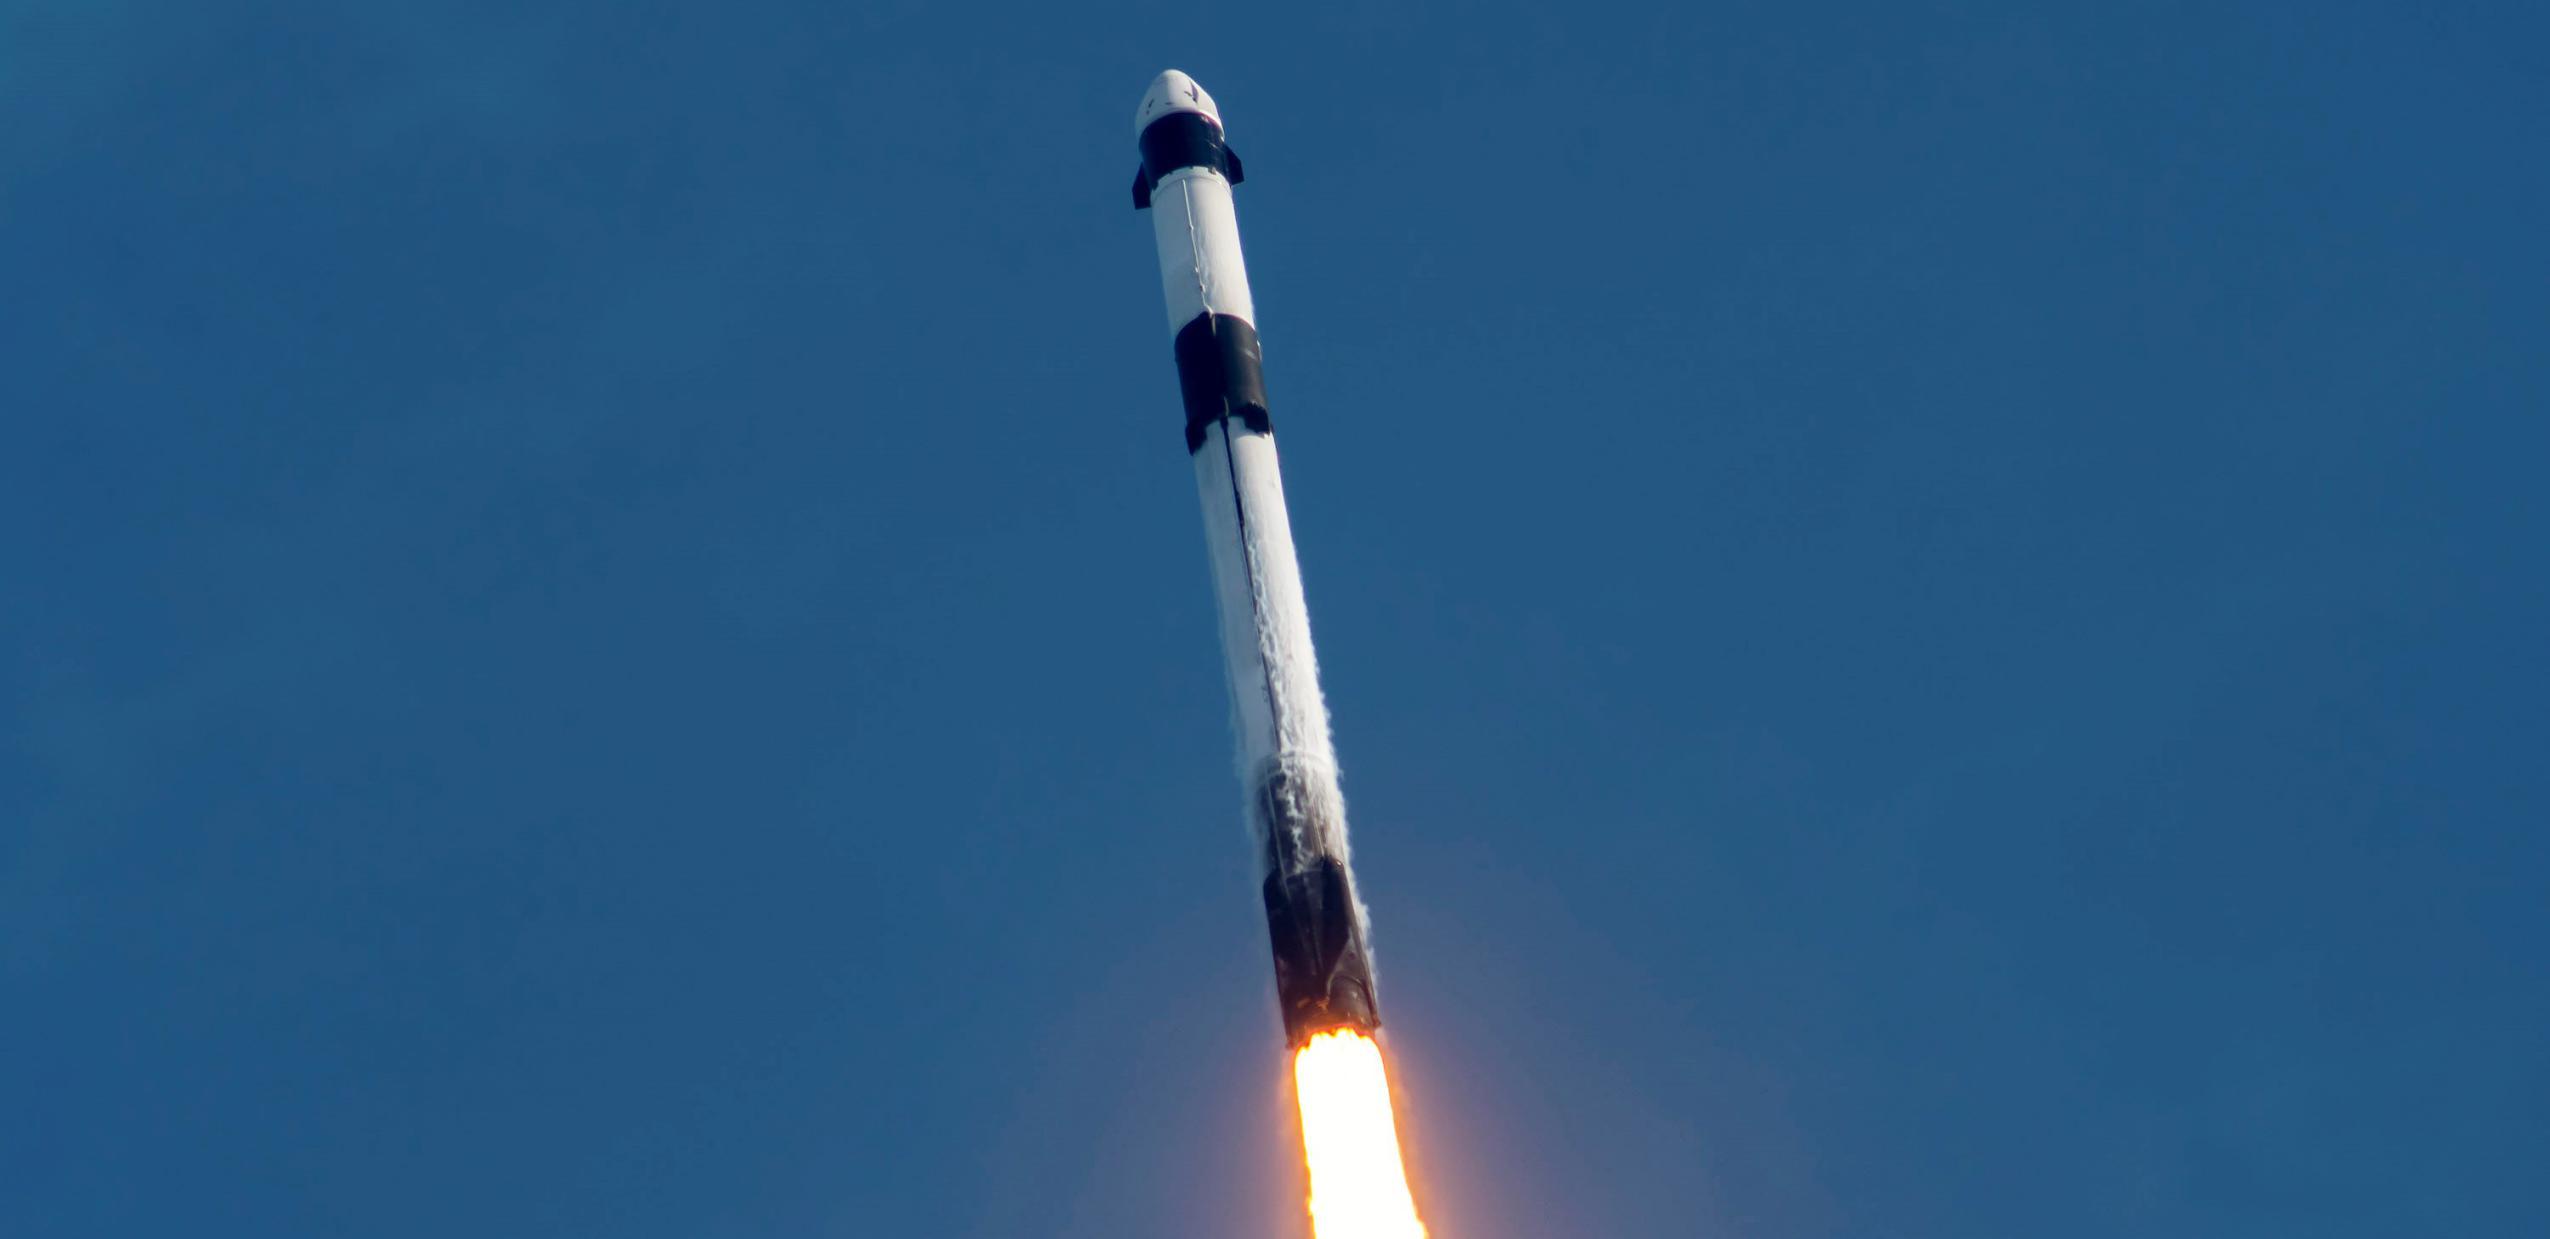 CRS-21 Cargo Dragon 2 Falcon 9 B1058 120620 launch (SpaceX) 6 crop (c)